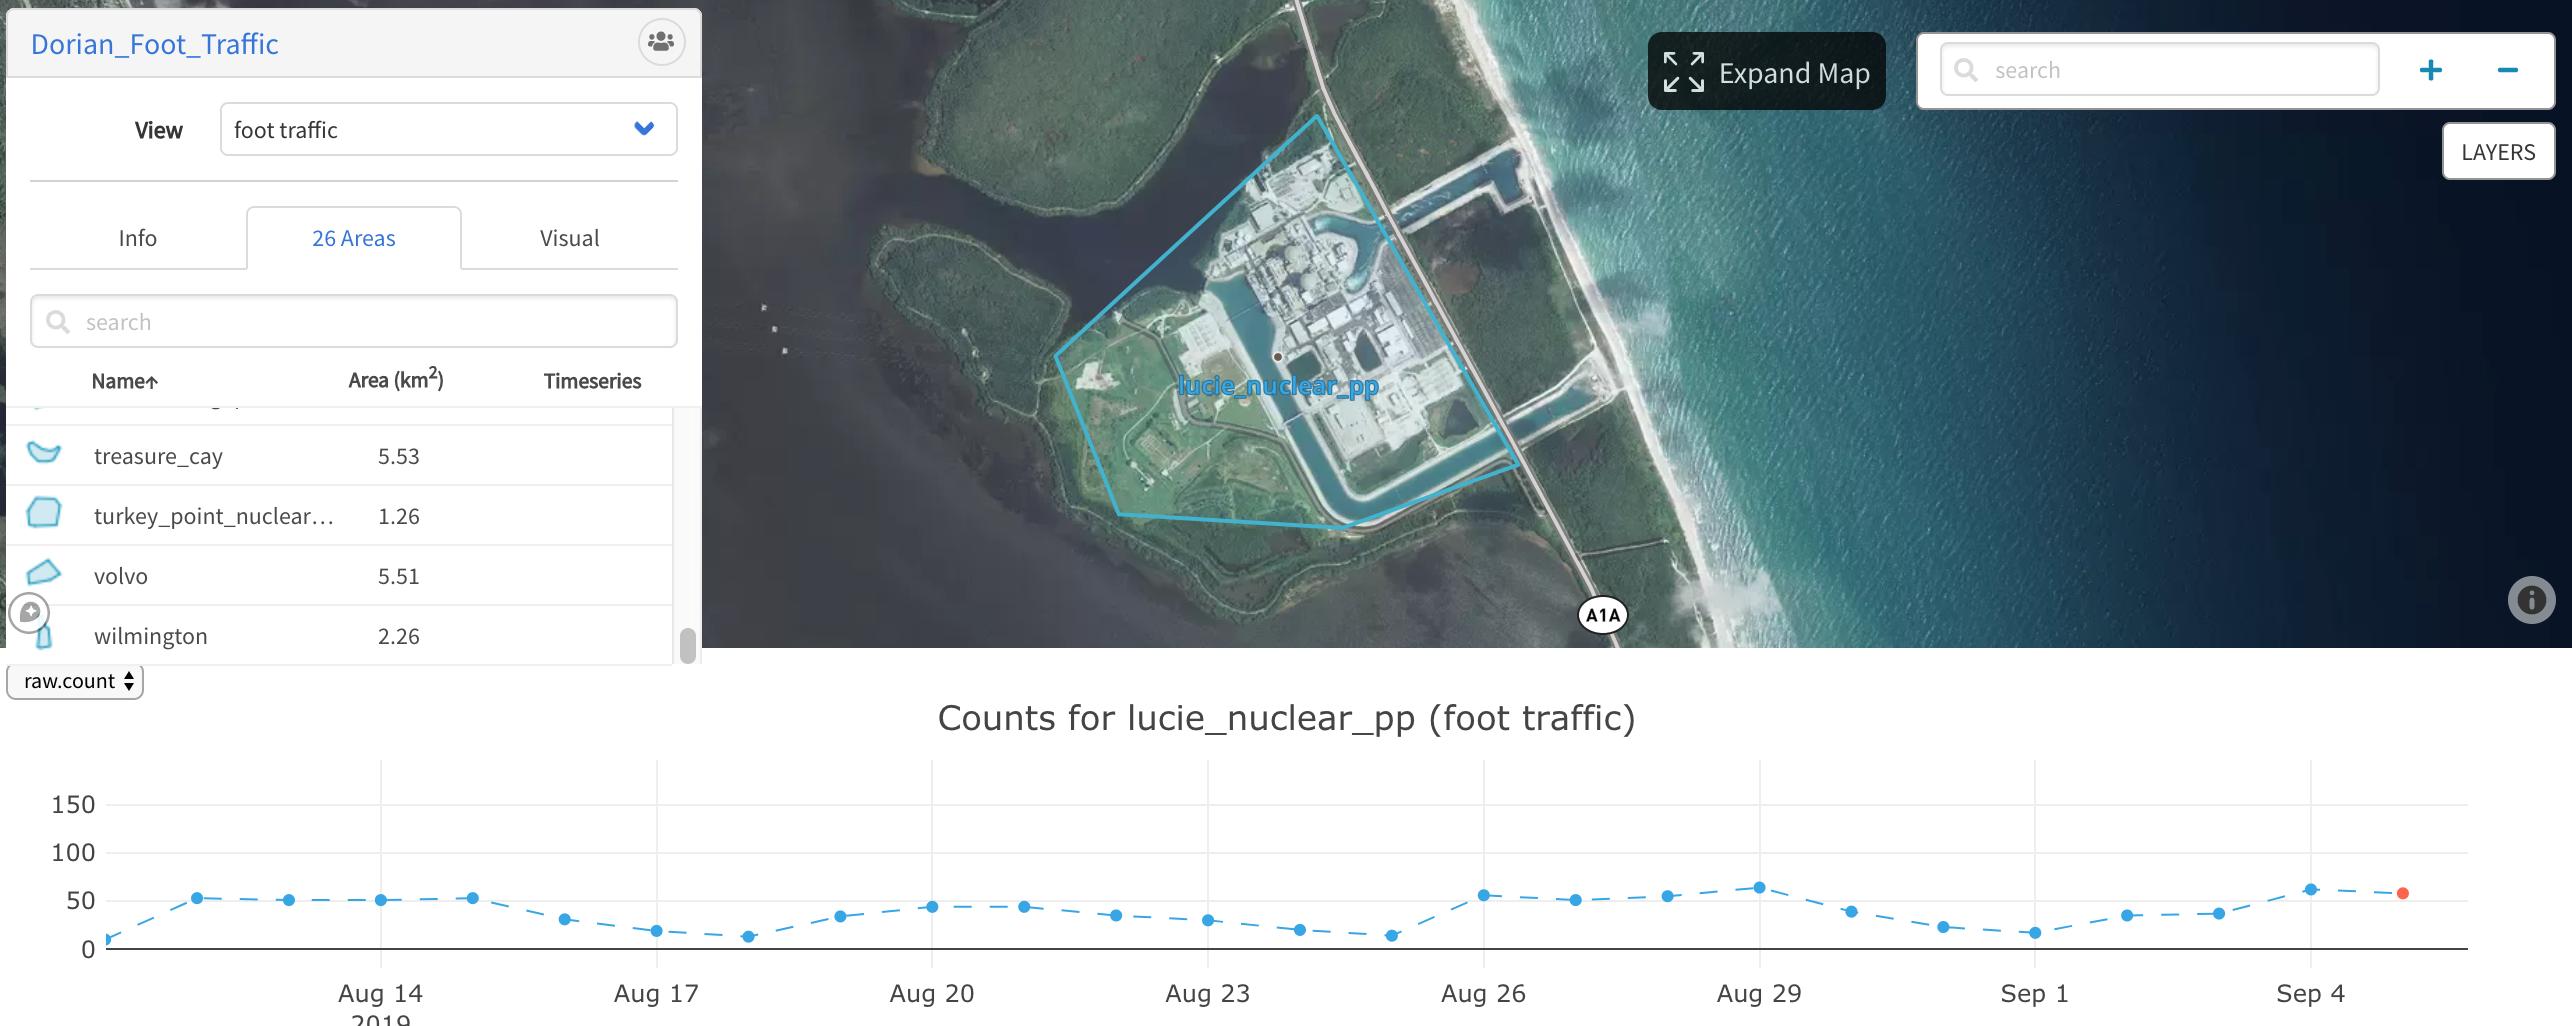 Lucie nuclear power plant